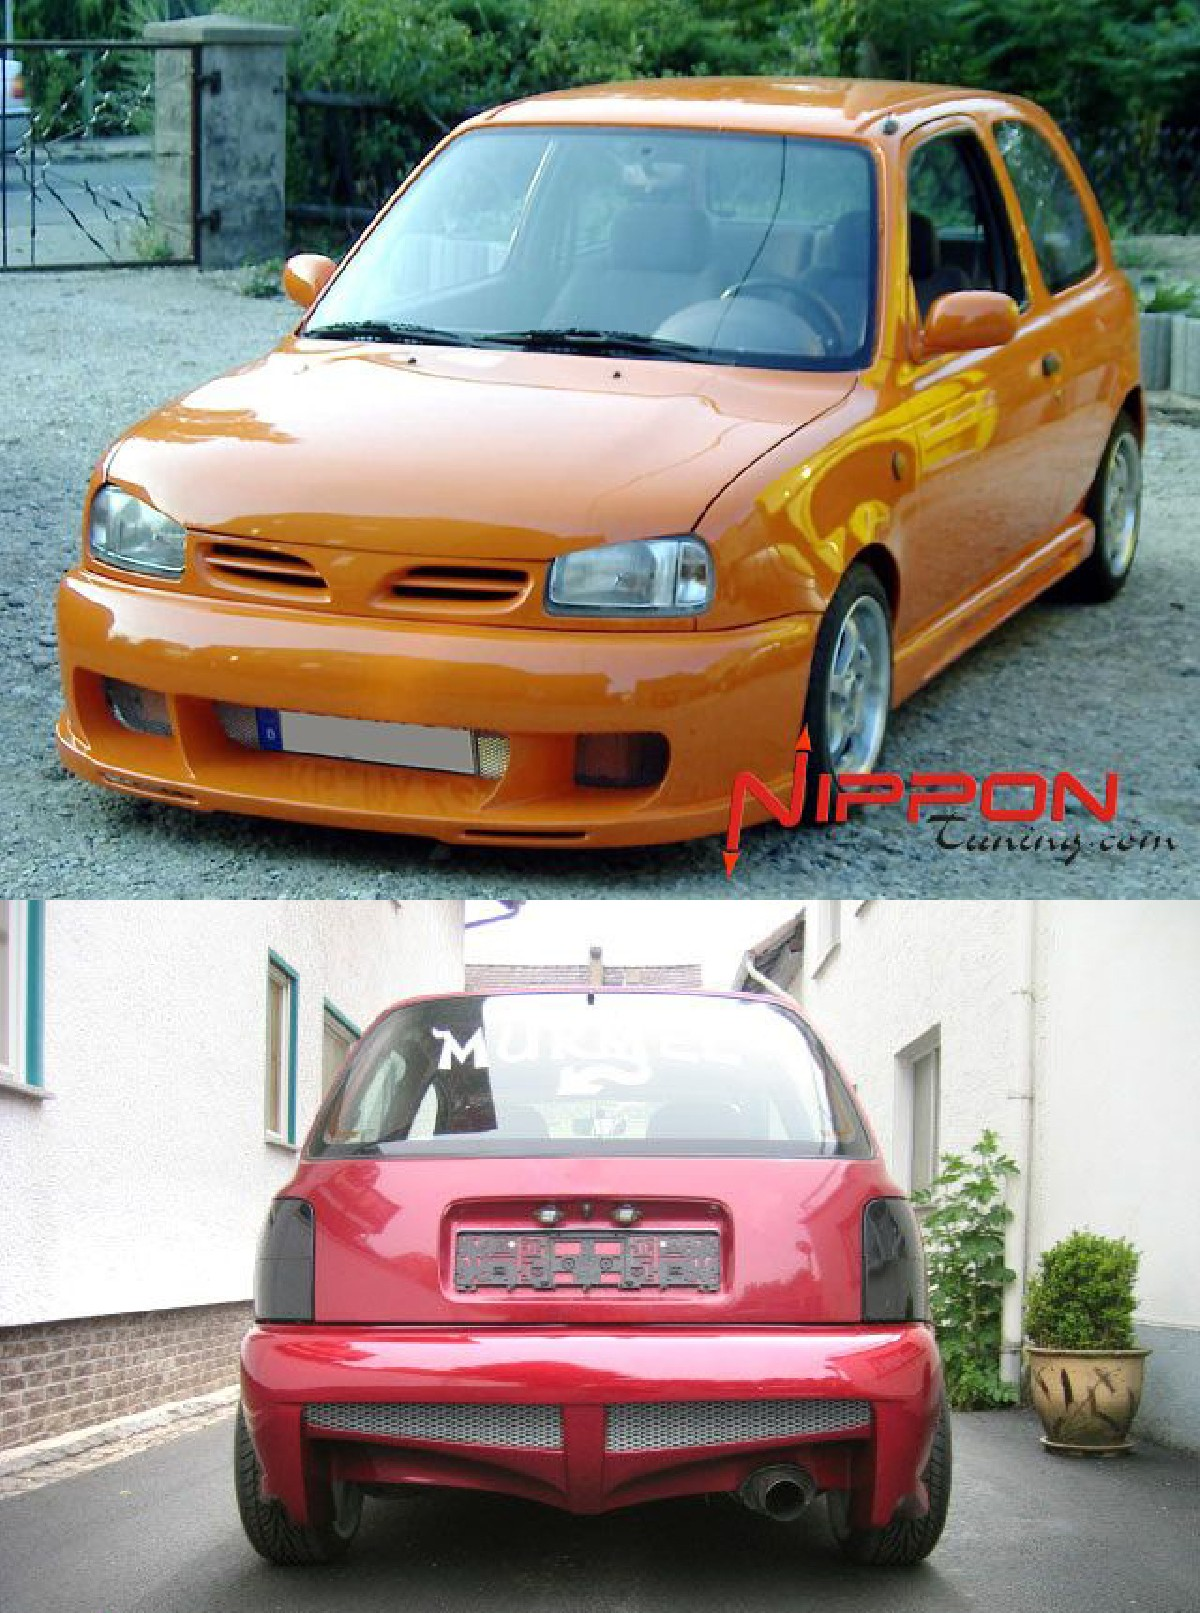 Nipponstyle Bodykit Nissan Micra K11